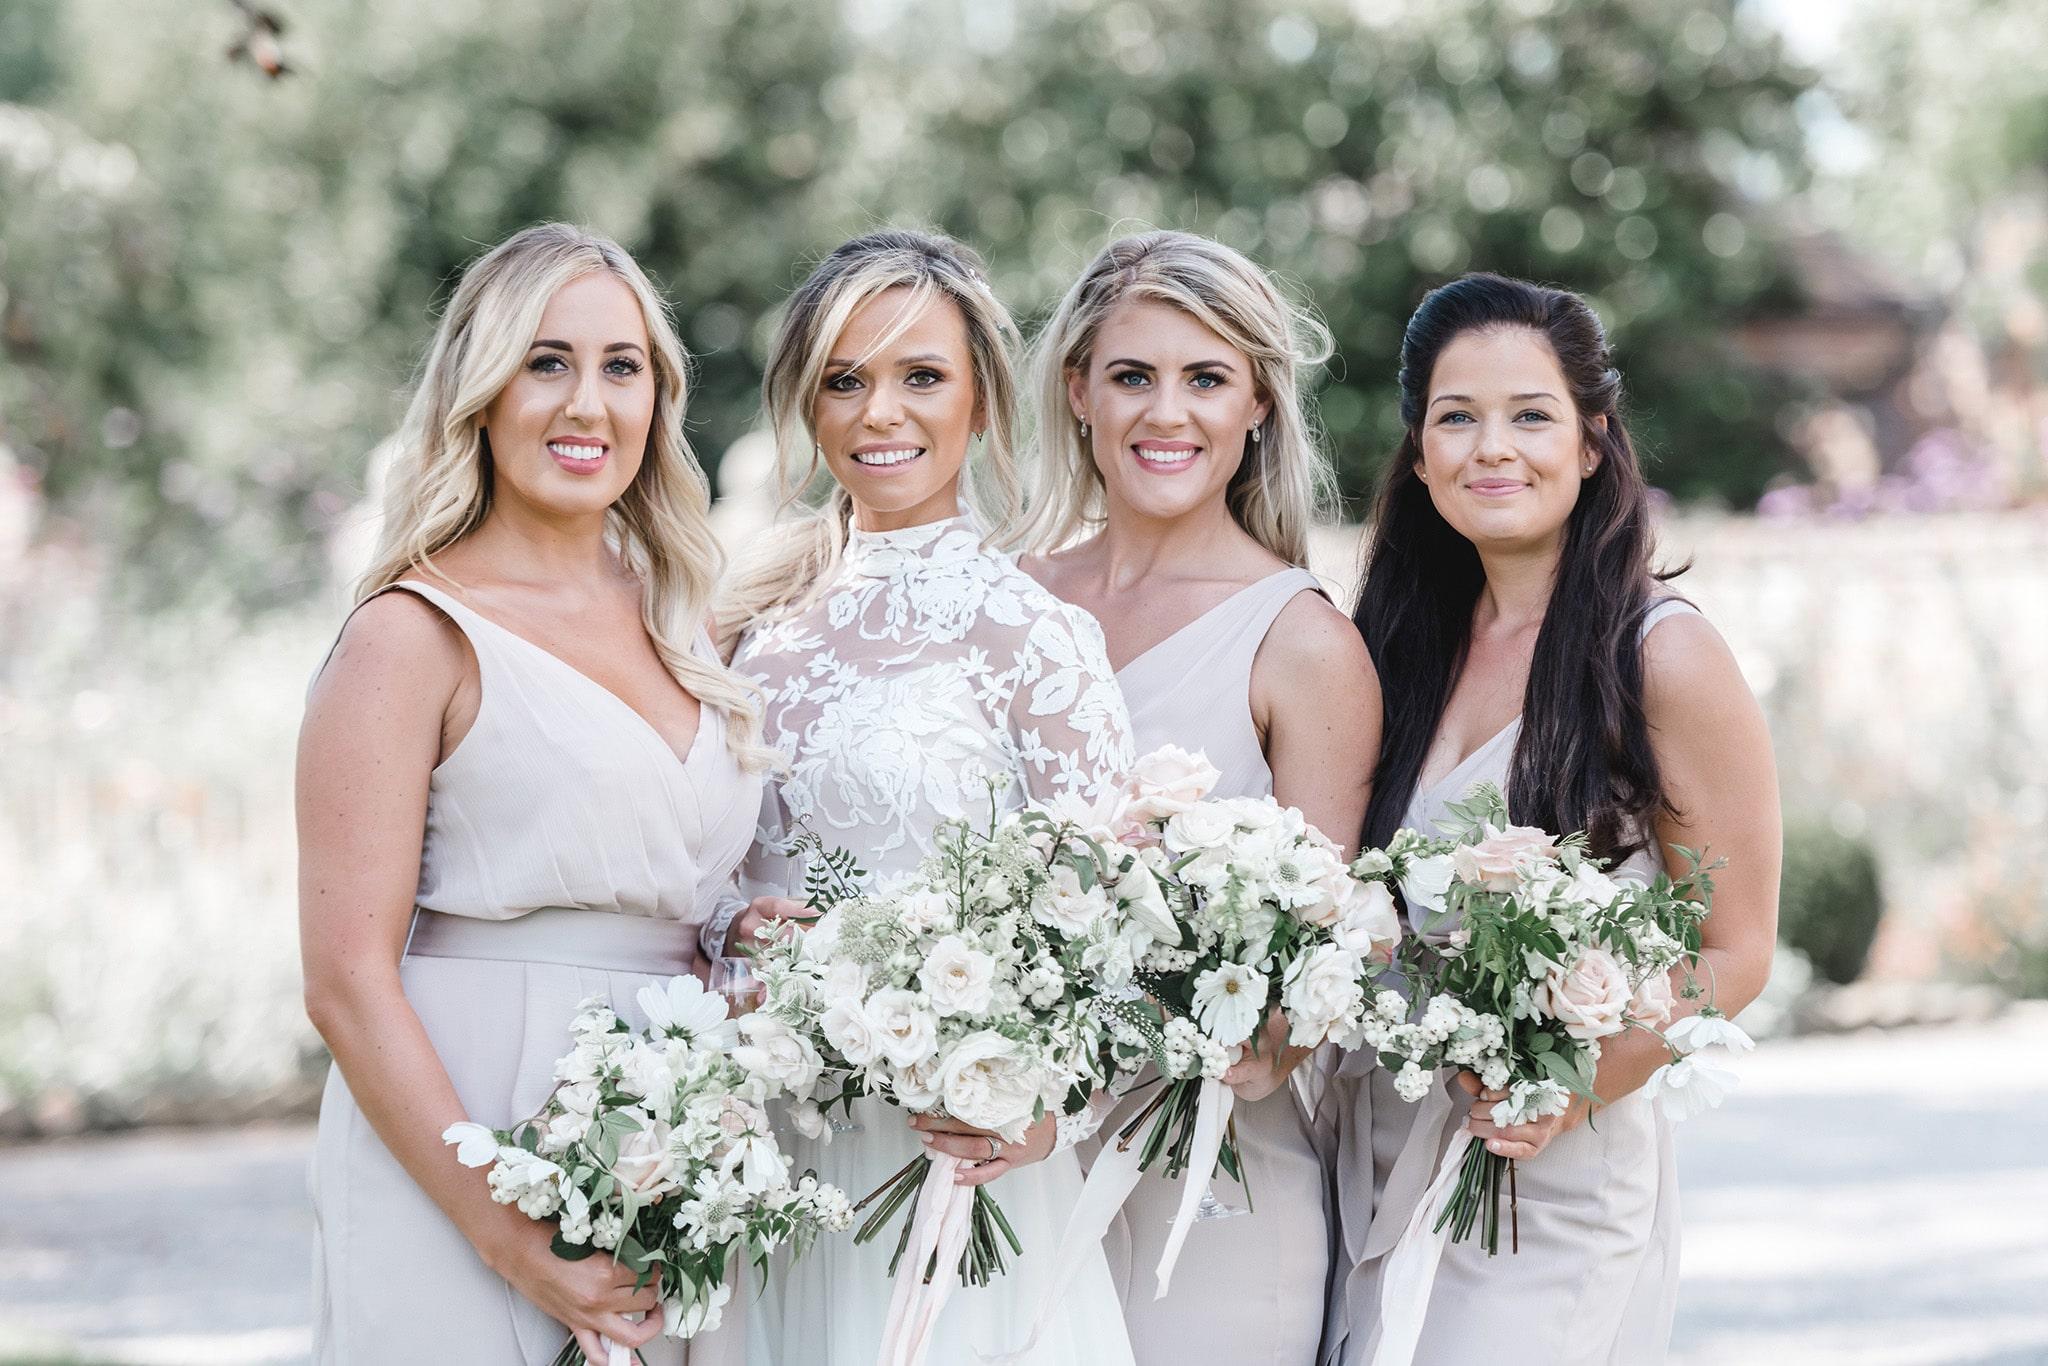 wedding trends 2020, wedding trends, gloucester wedding photographer, elmore court